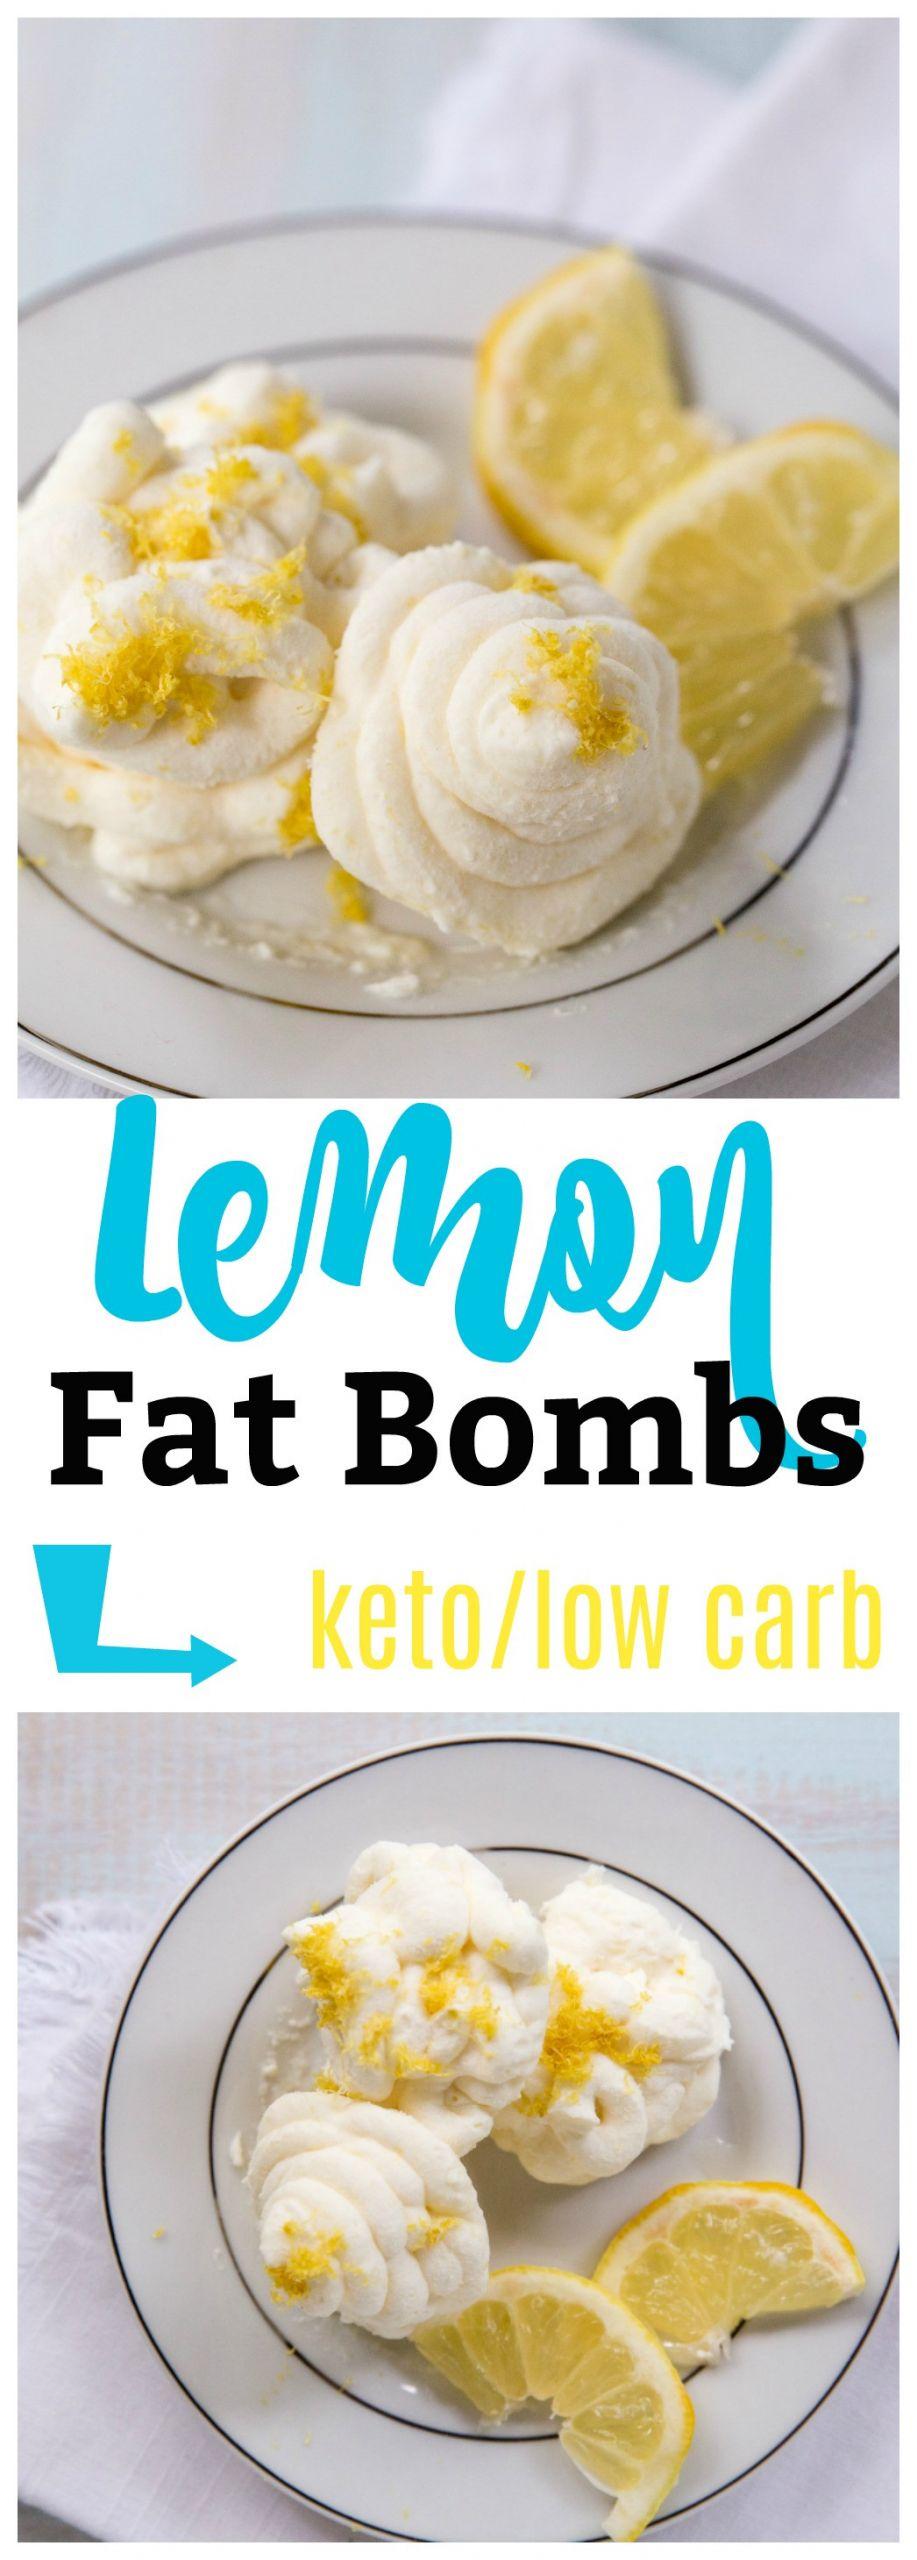 Low Fat Keto Recipes  Easy Lemon Keto Bomb Recipe Low Carb Friendly